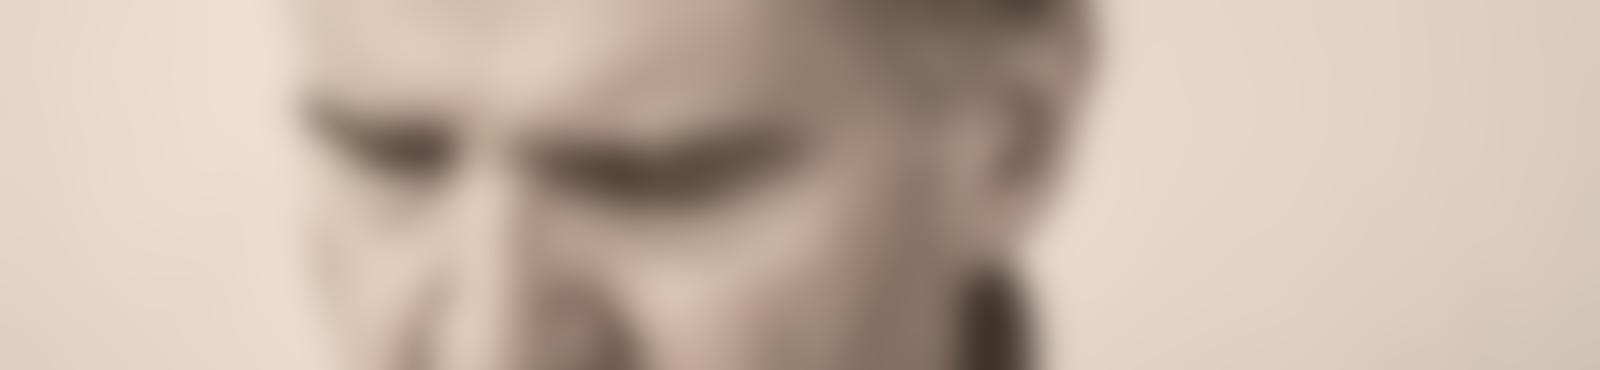 Blurred 4a1a67dc 58e0 4aa0 8409 176d88edce89